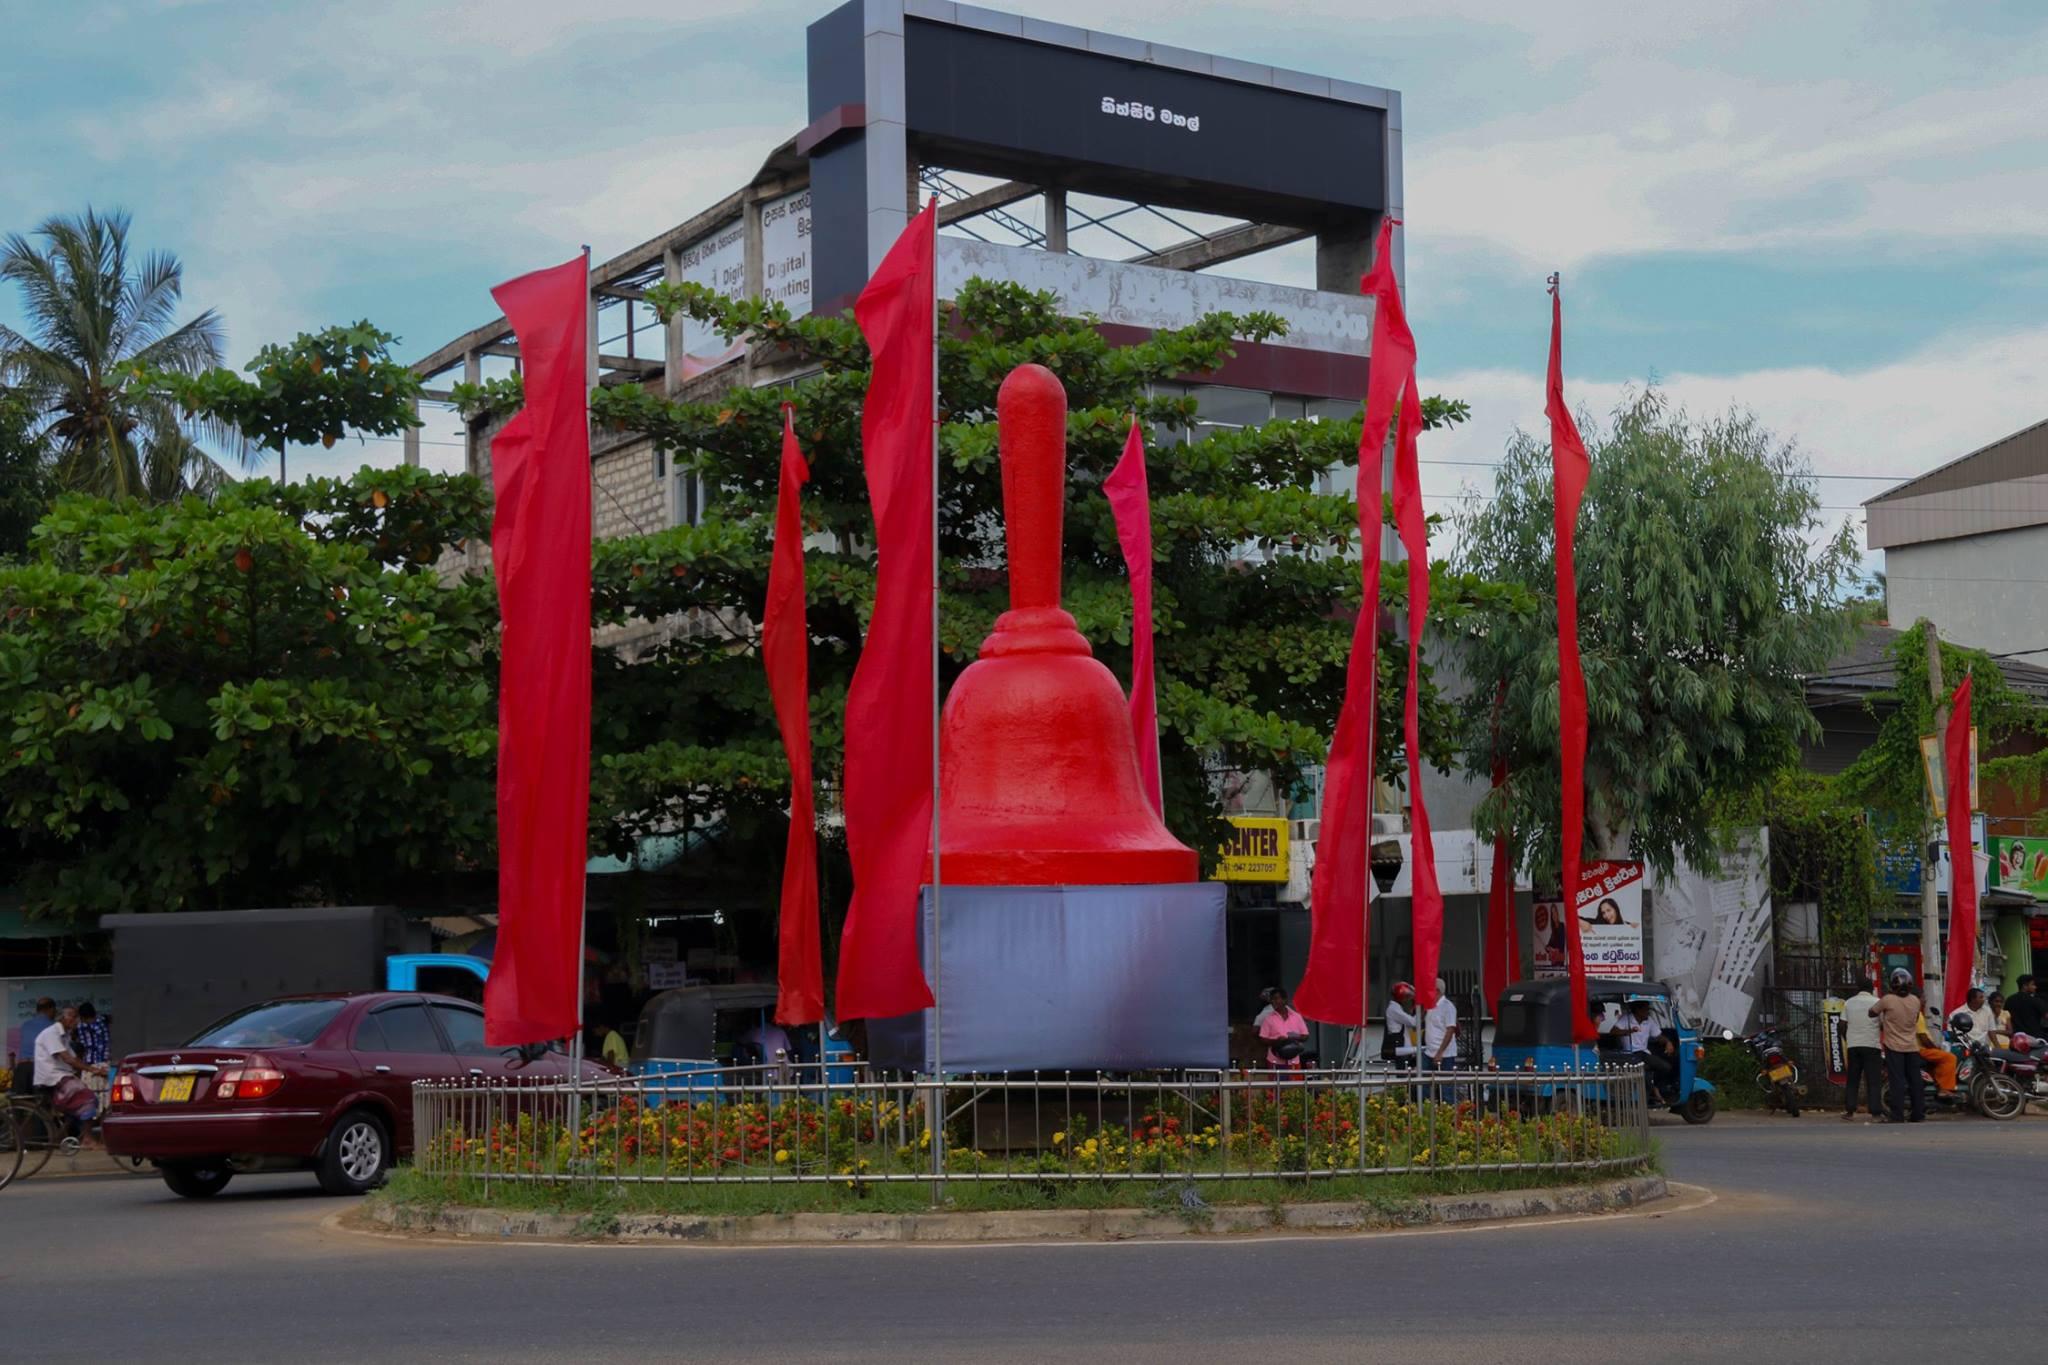 Thissa-Maharama-2018.01.10-9c